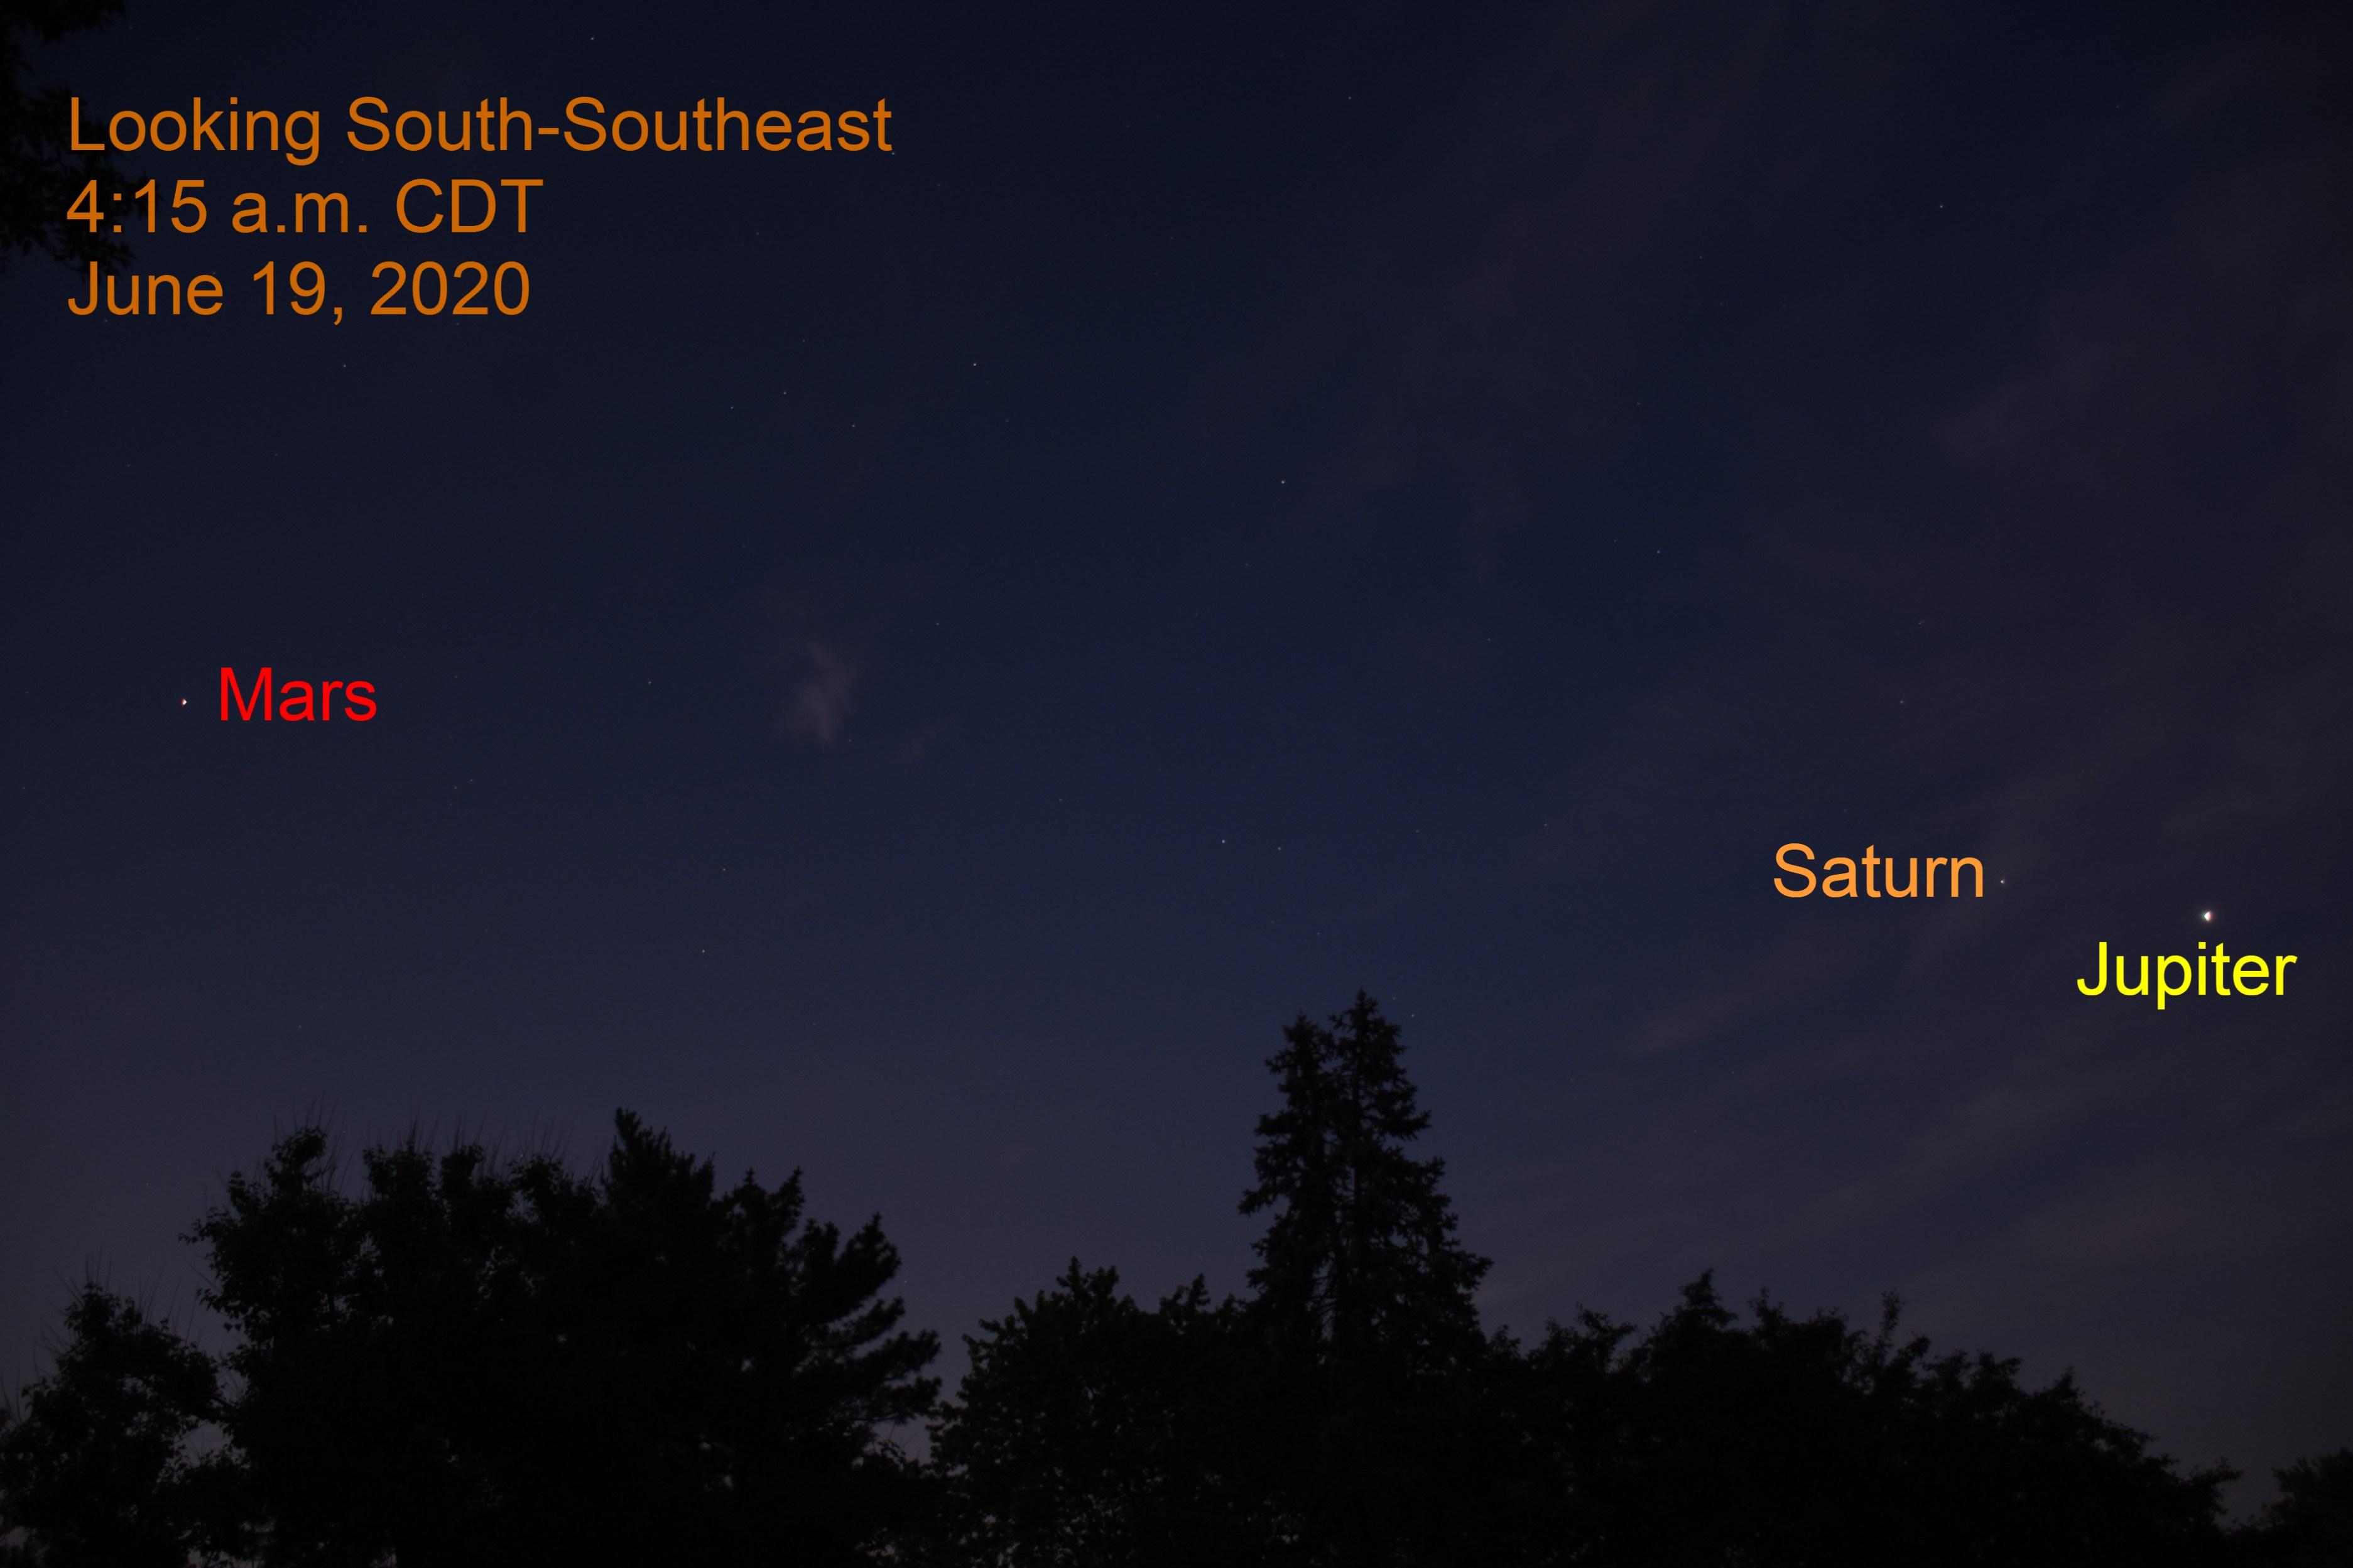 Mars, Saturn, and Jupiter before sunrise, June 19, 2020